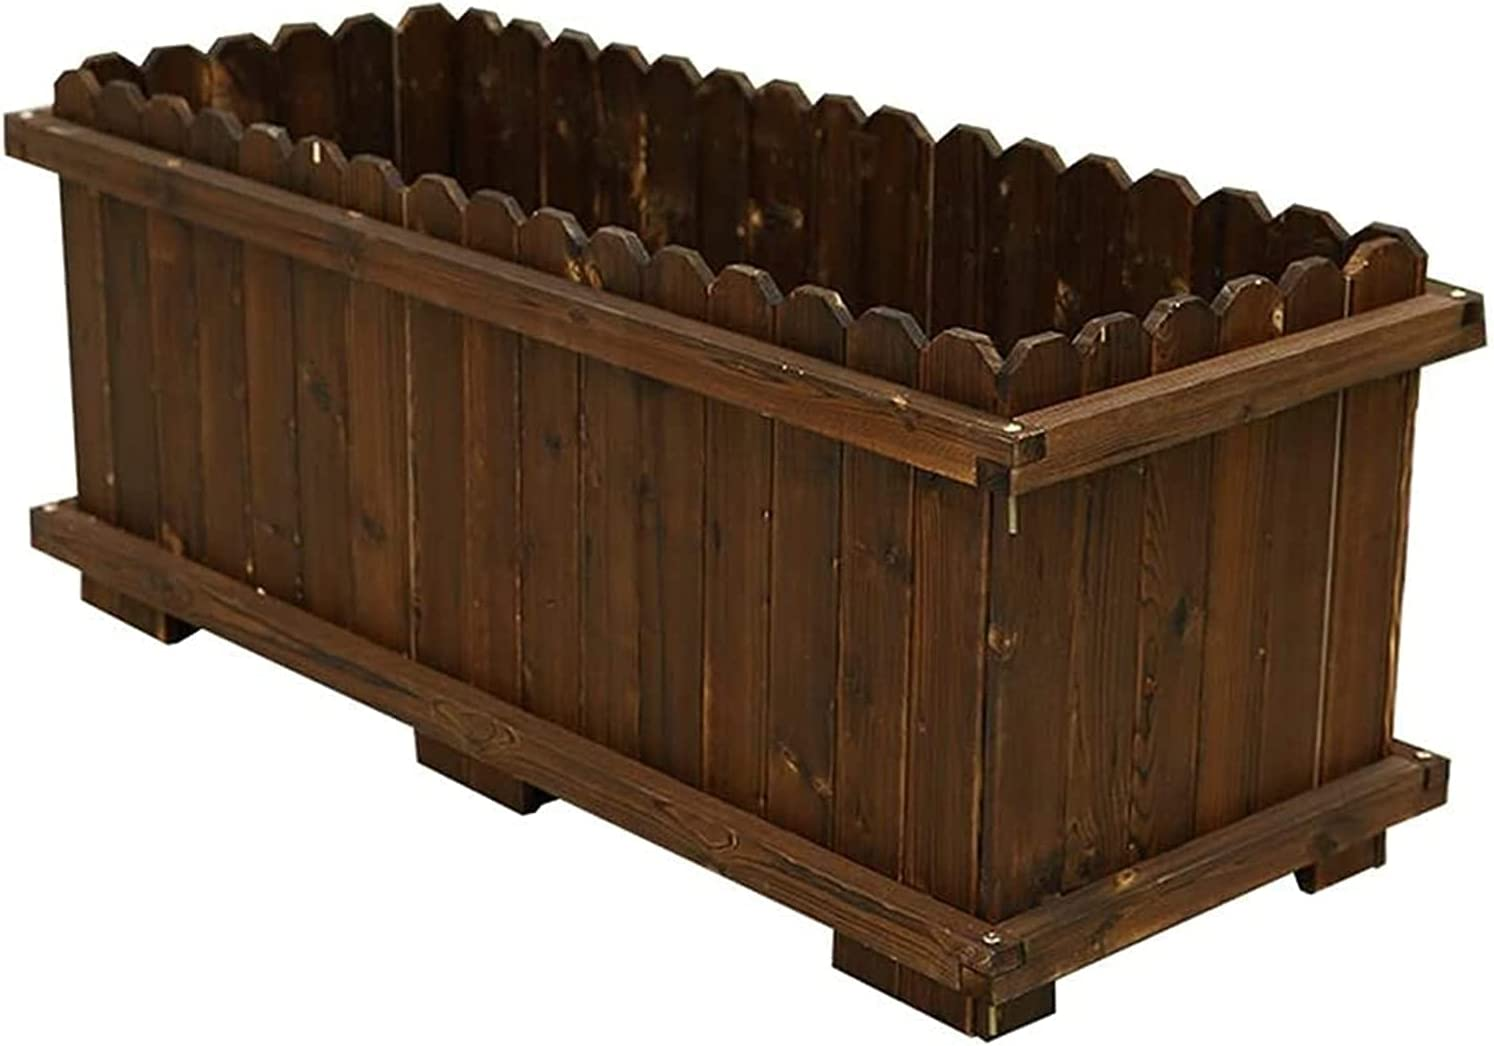 Garden Bed lowest price Planter Atlanta Mall Box Planting Rectangle Raised